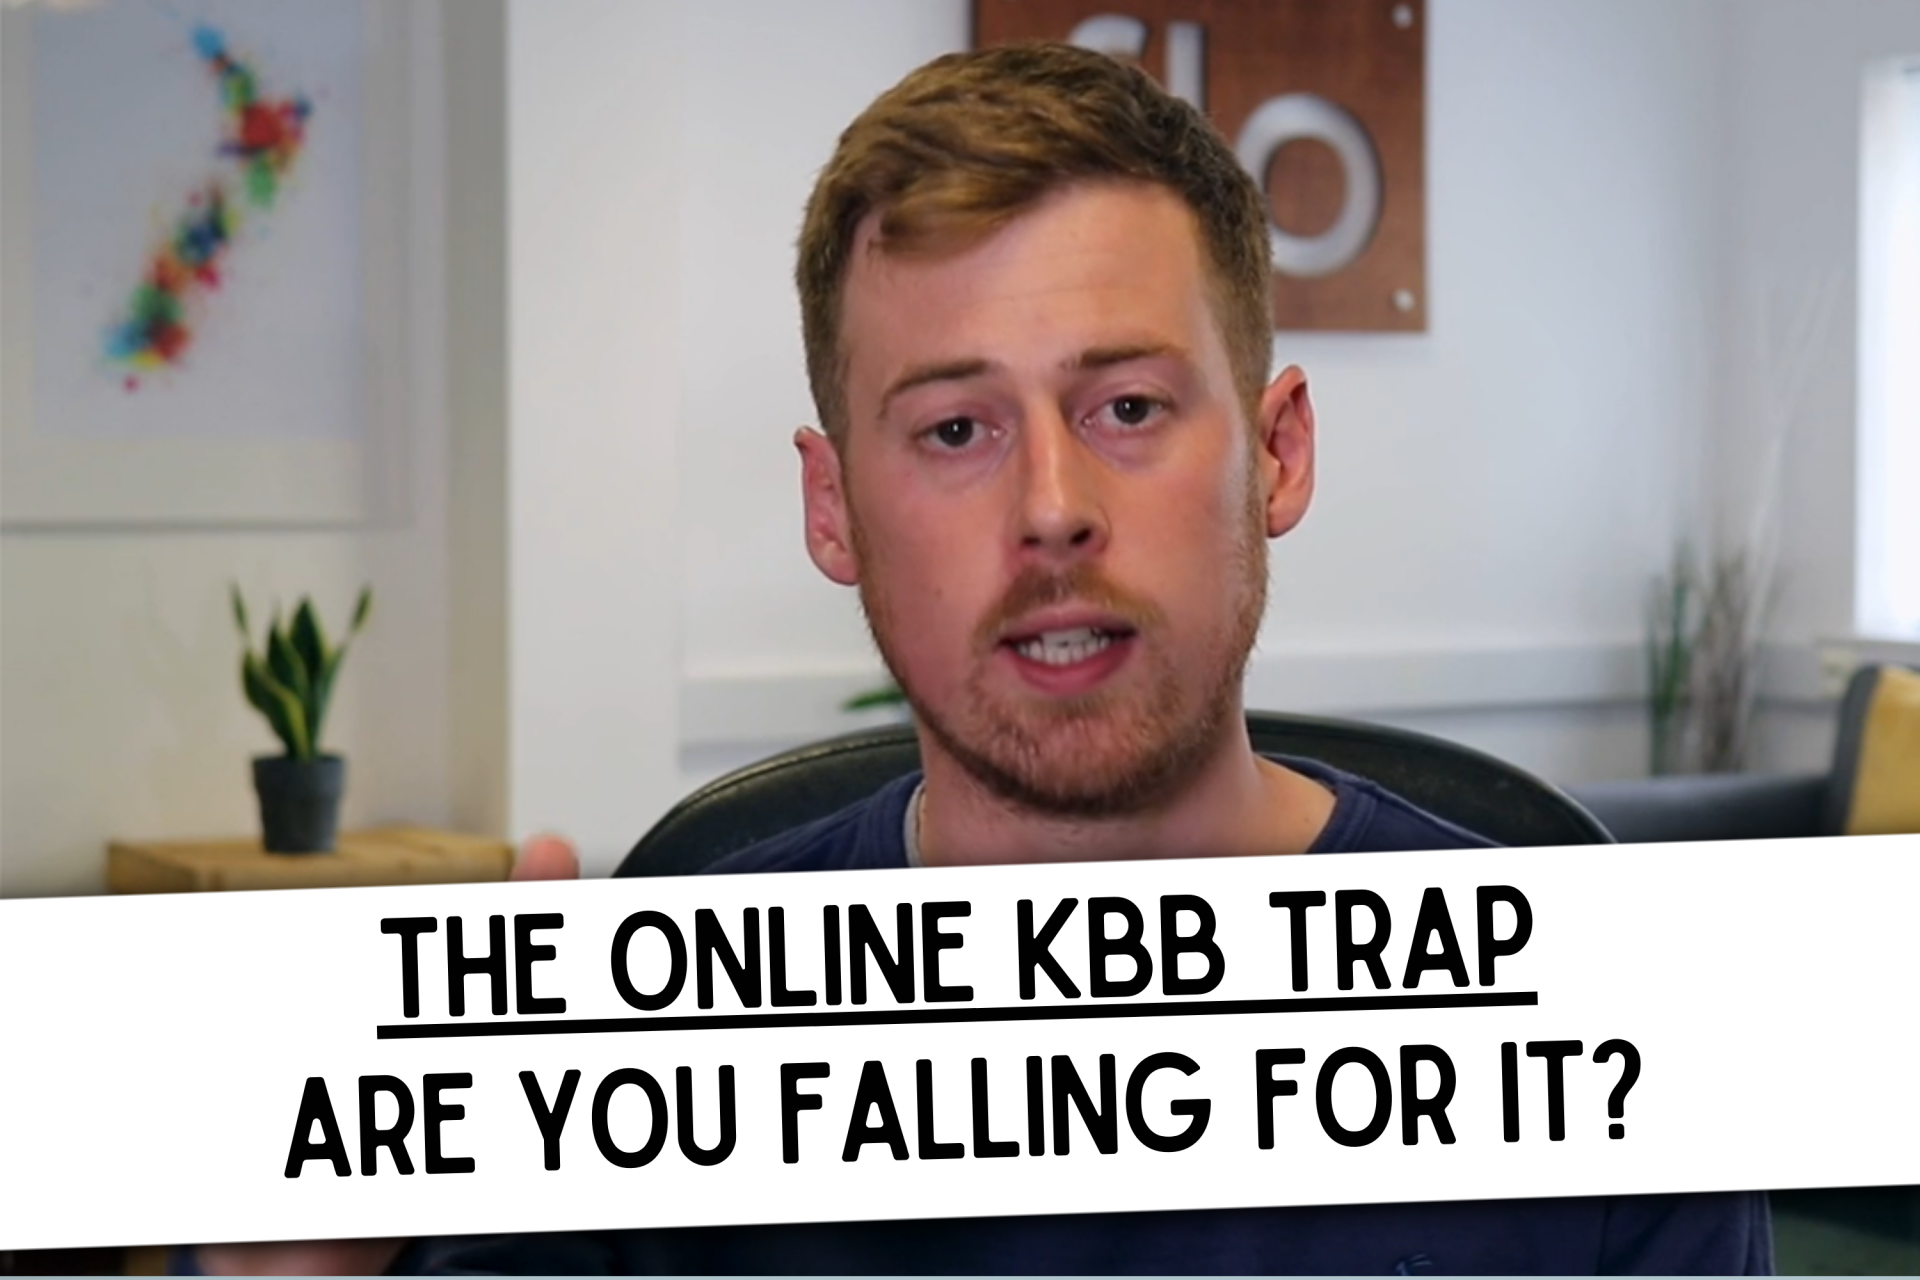 The online KBB trap